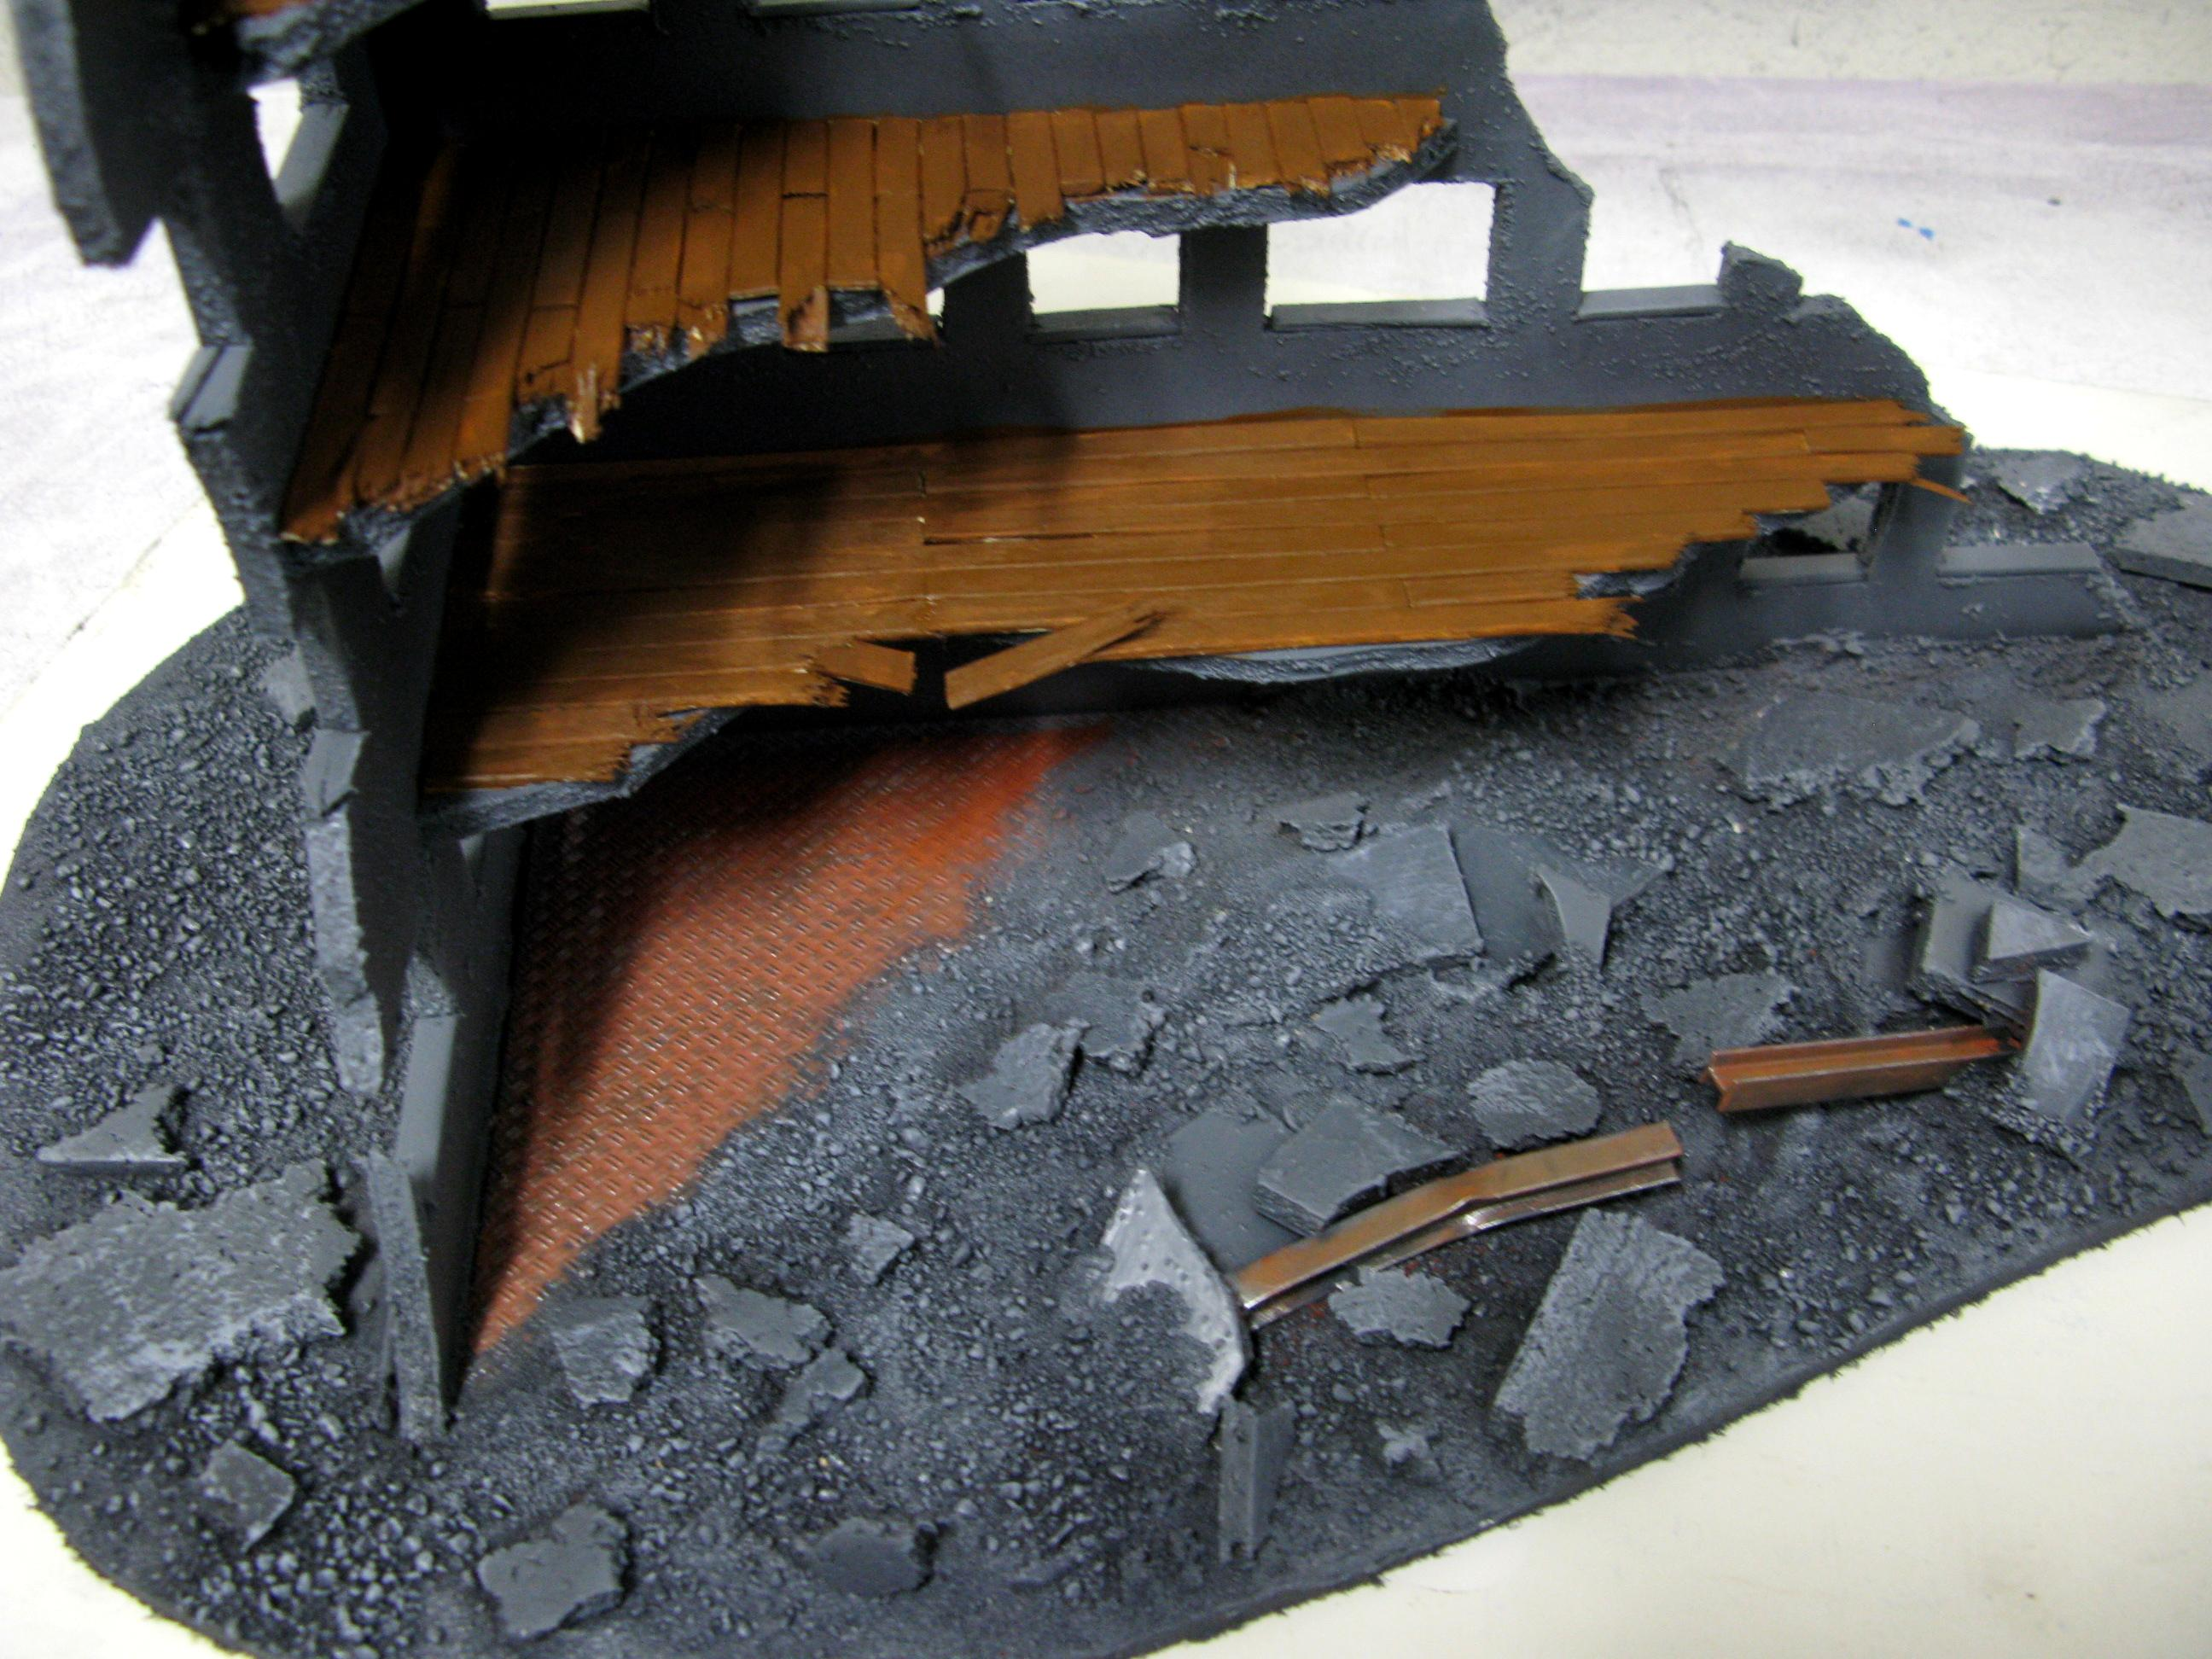 Buildings, Cities Of Death, Mdf, Ruins, Rust, Terrain. Rubble